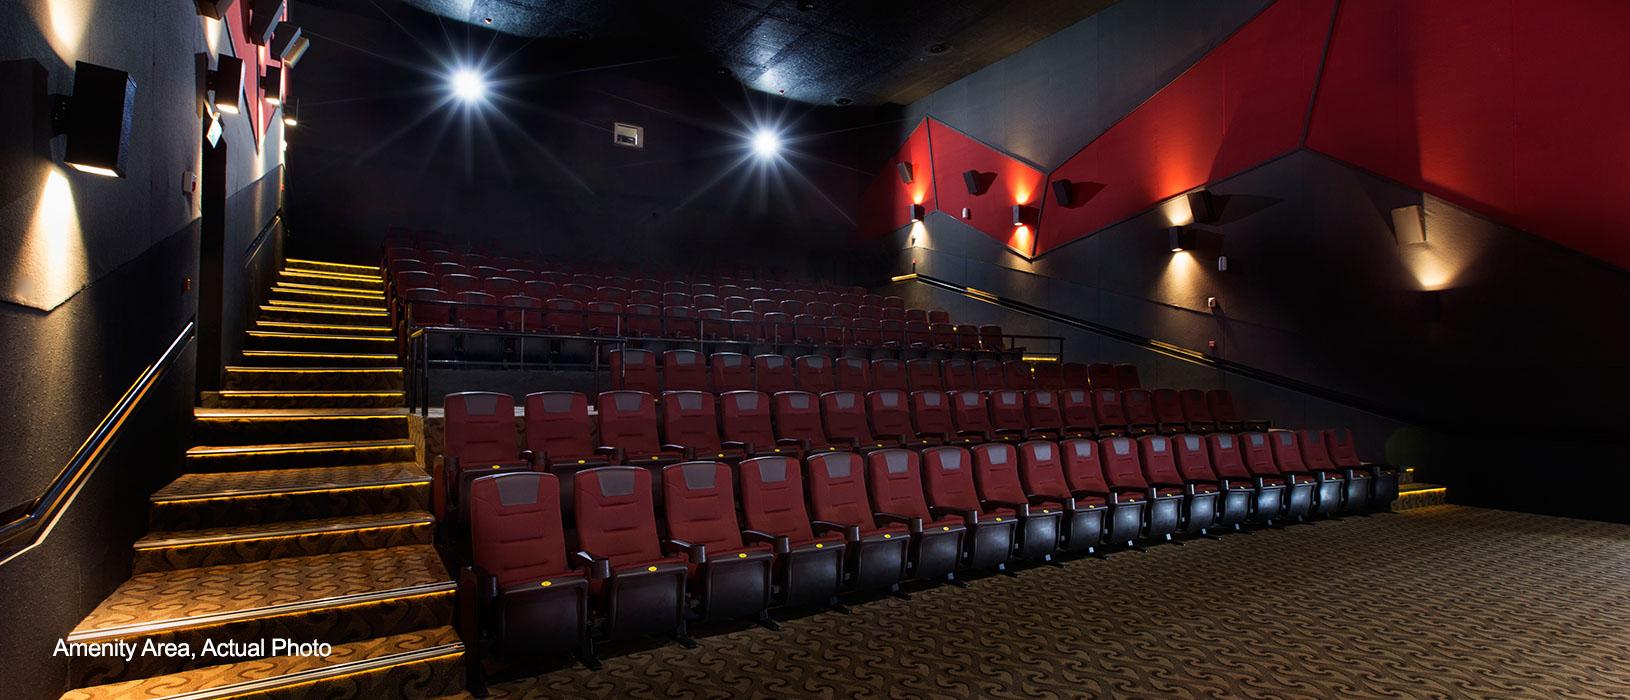 Light Residences Cinema